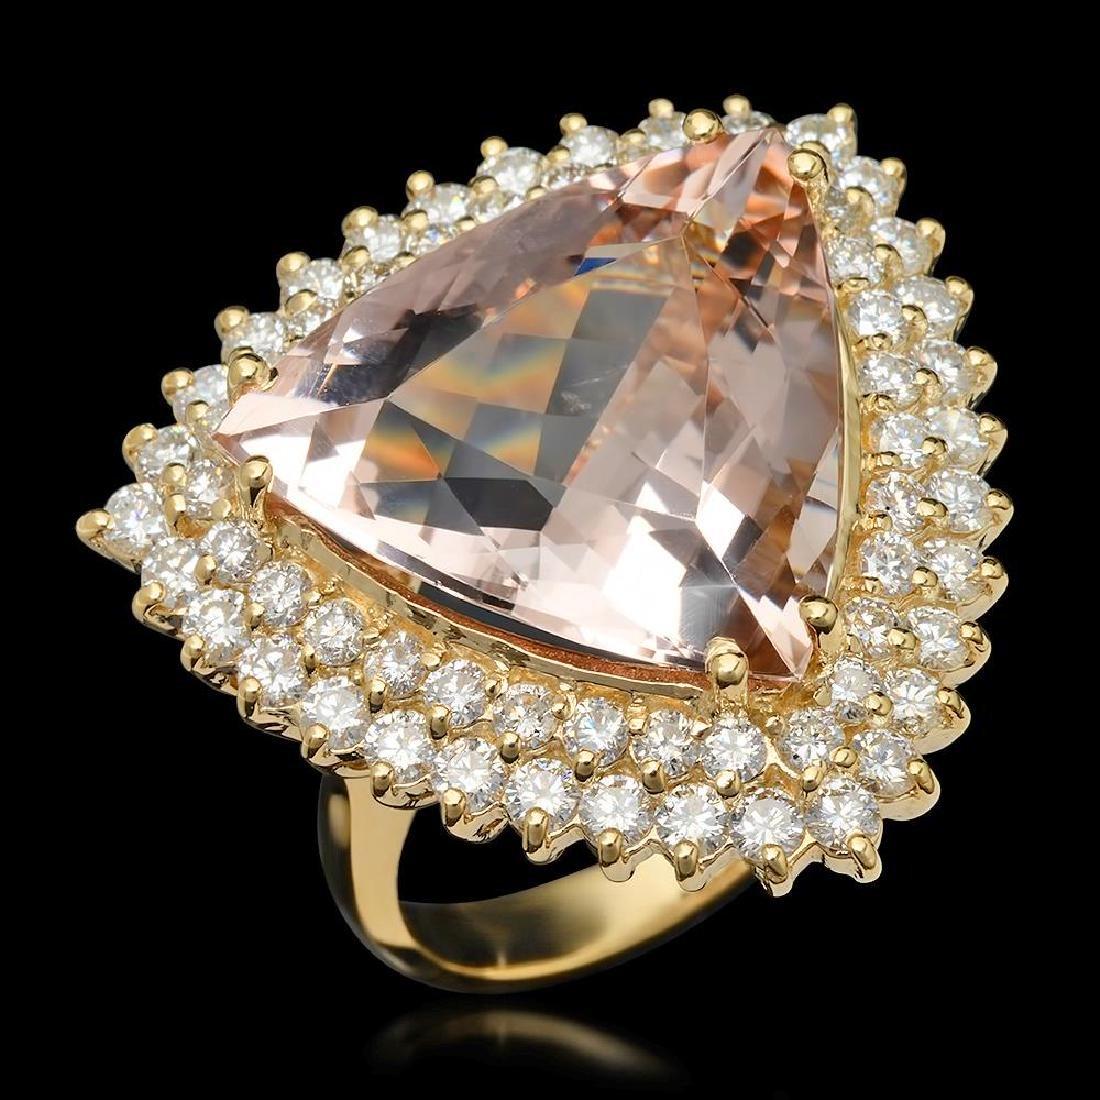 14K Gold 13.58ct Morganite 2.21ct Diamond Ring